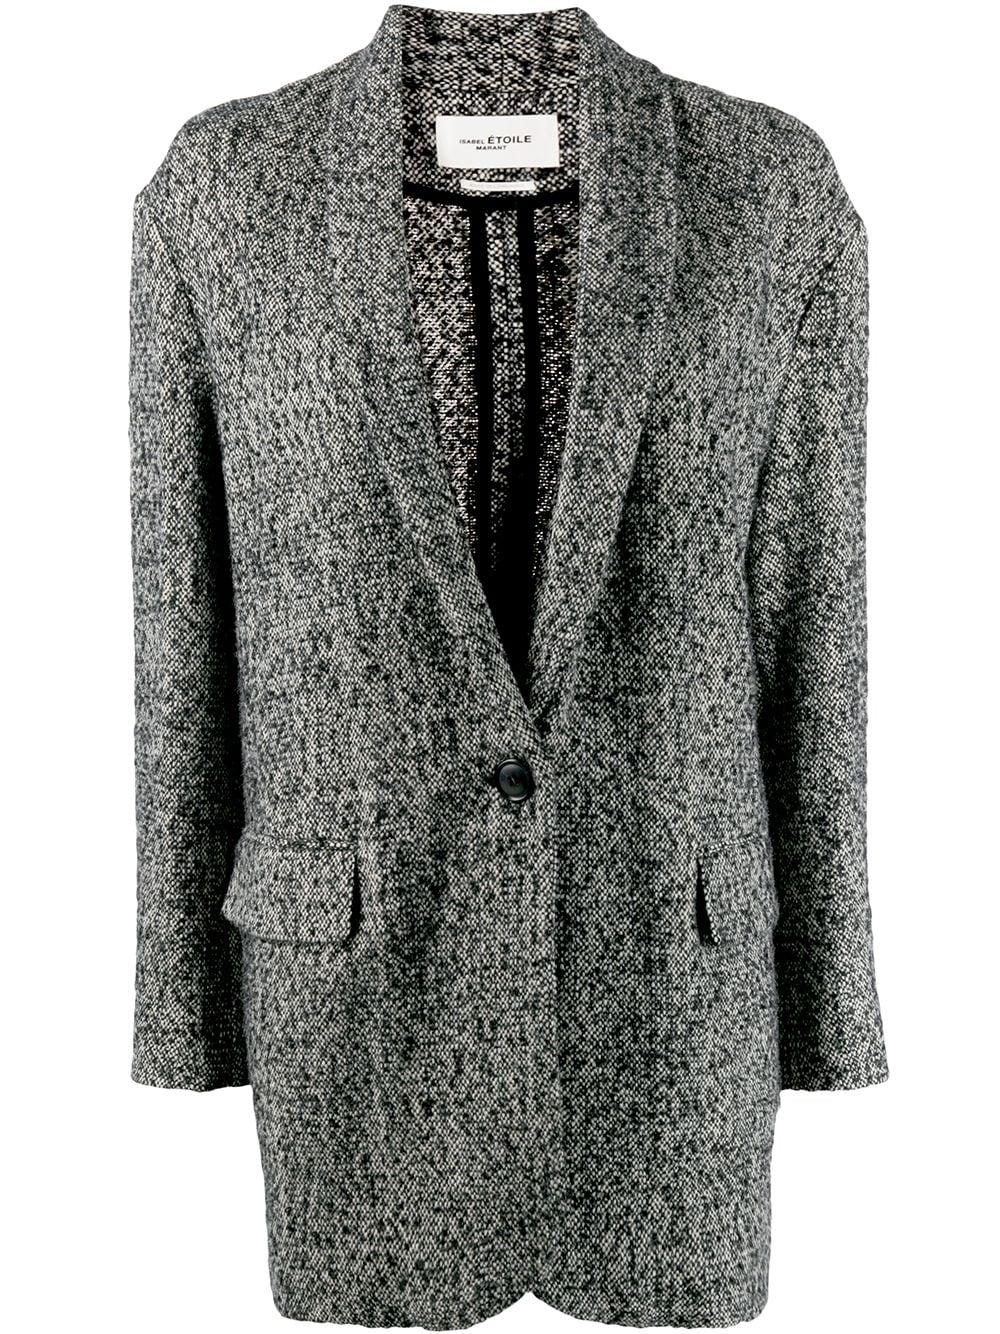 Backal Jacket